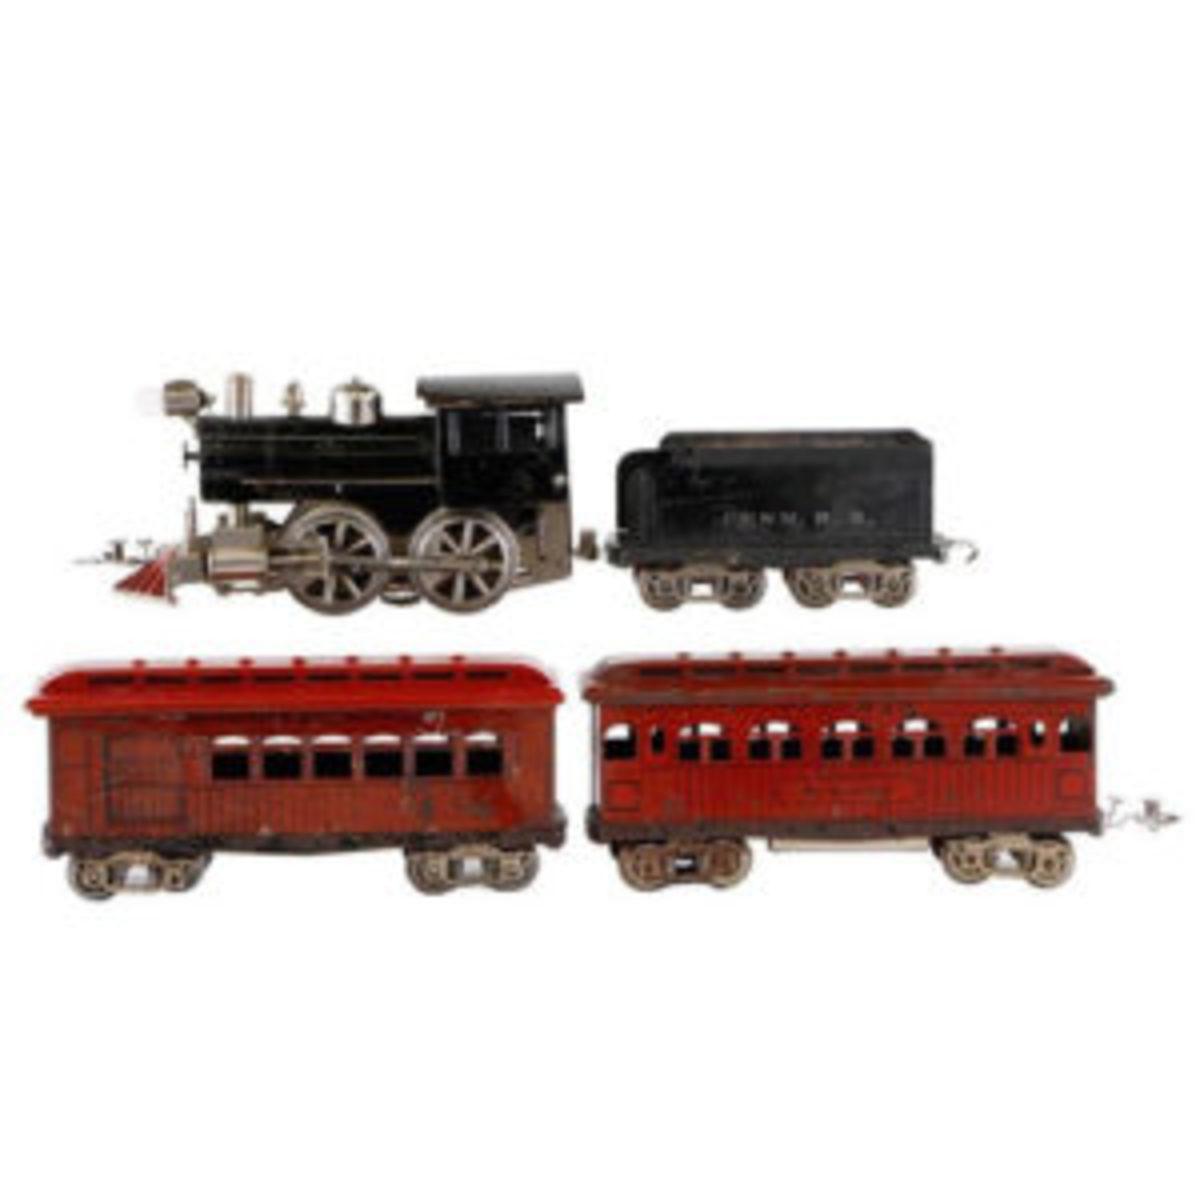 Elektoy locomotive set